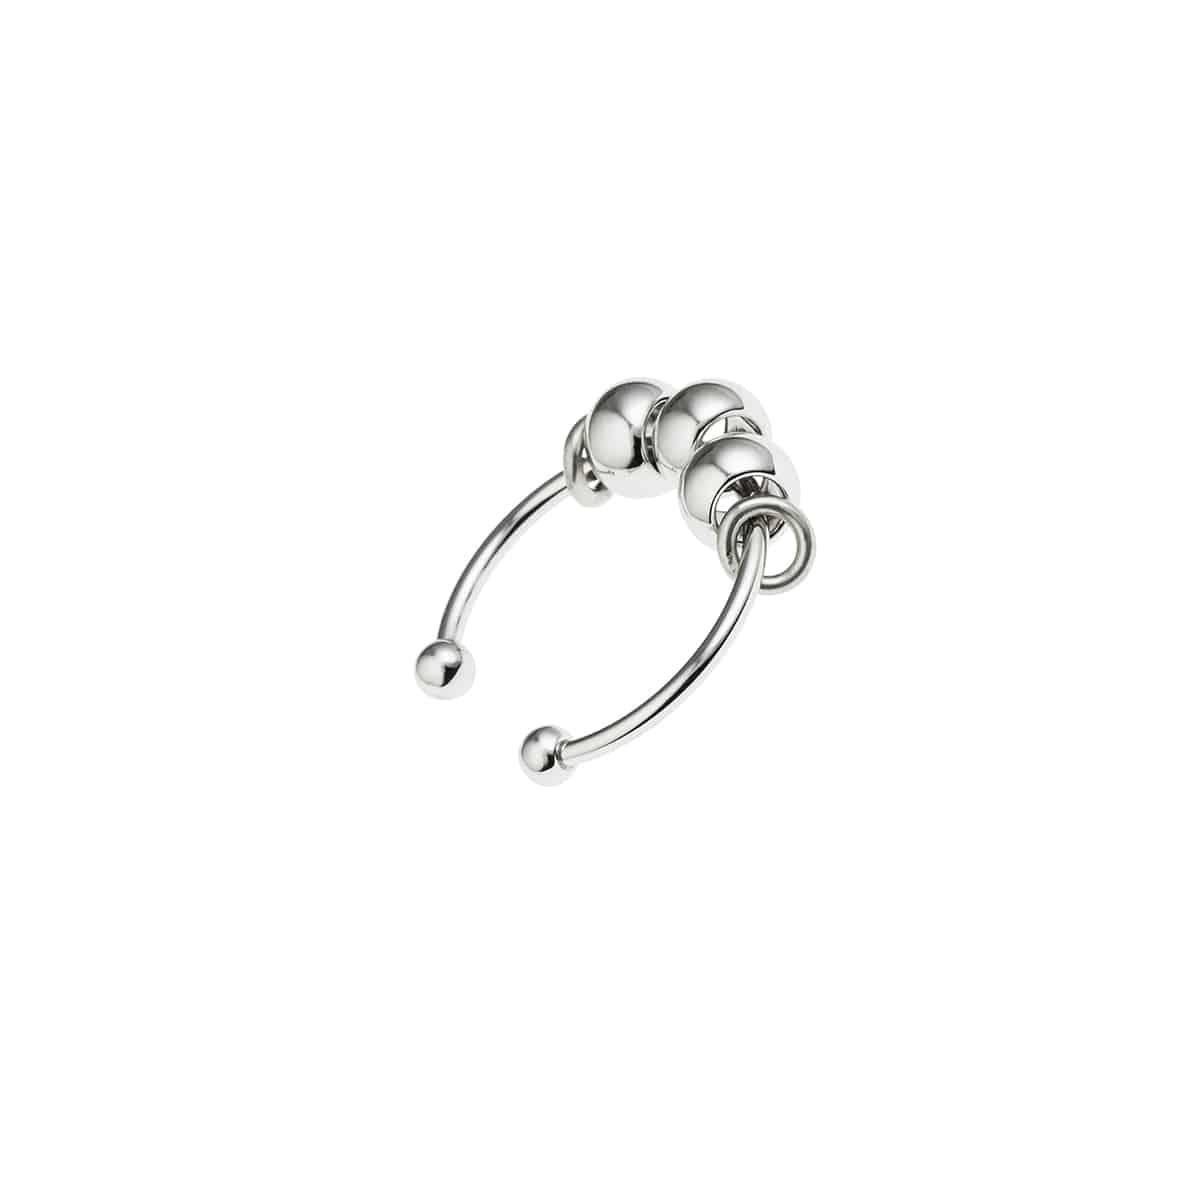 bague jaipur argent coralie de seynes l'Erudite Concept Store handmade jewellery